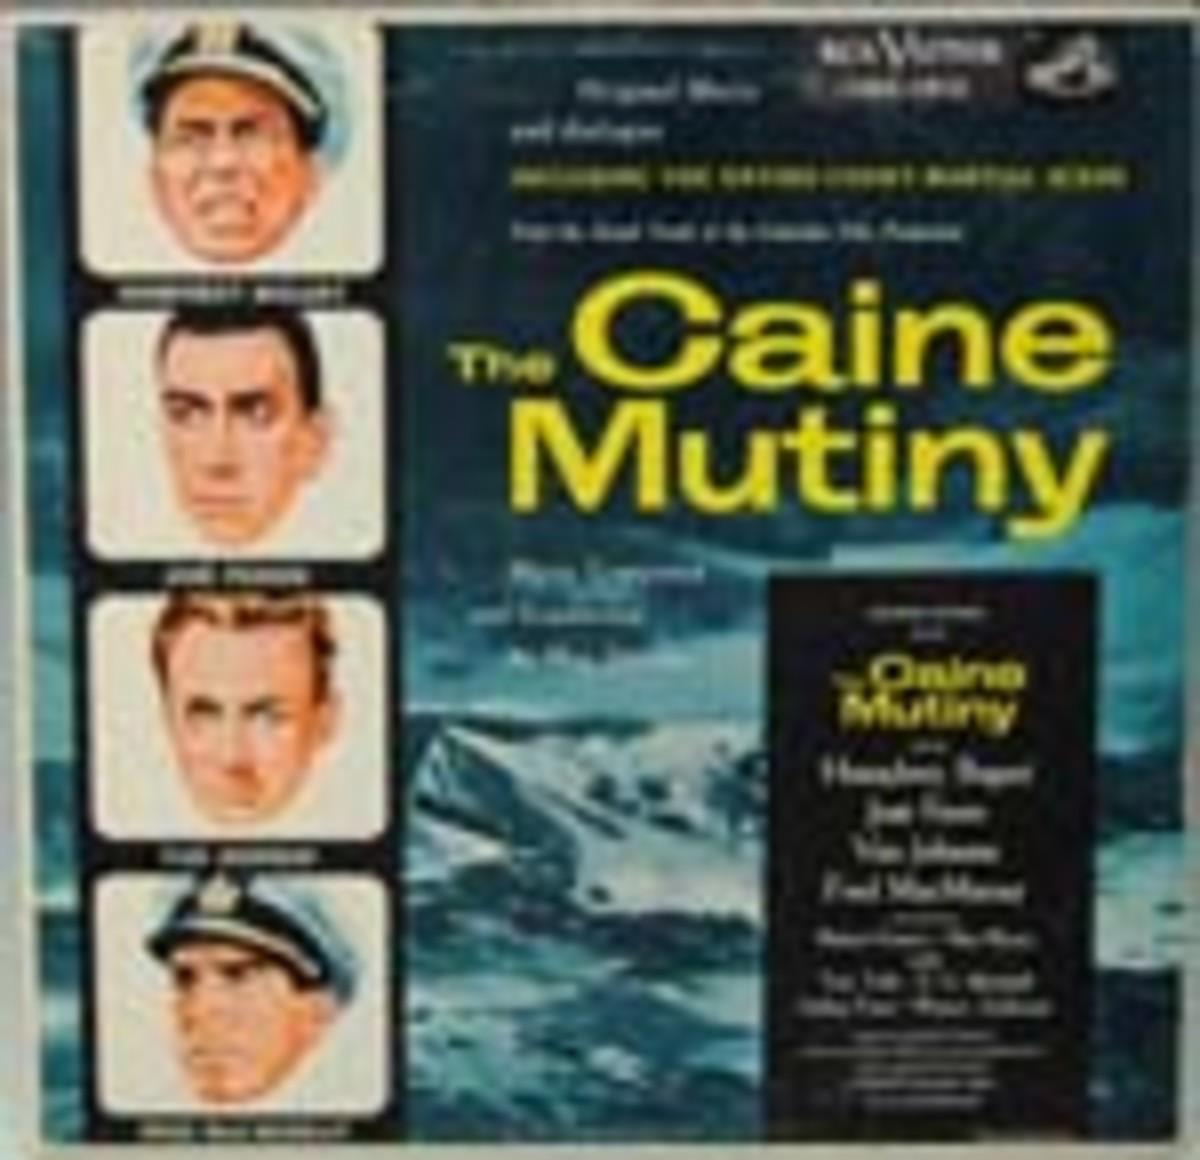 Caine Mutiny soundtrack rarity